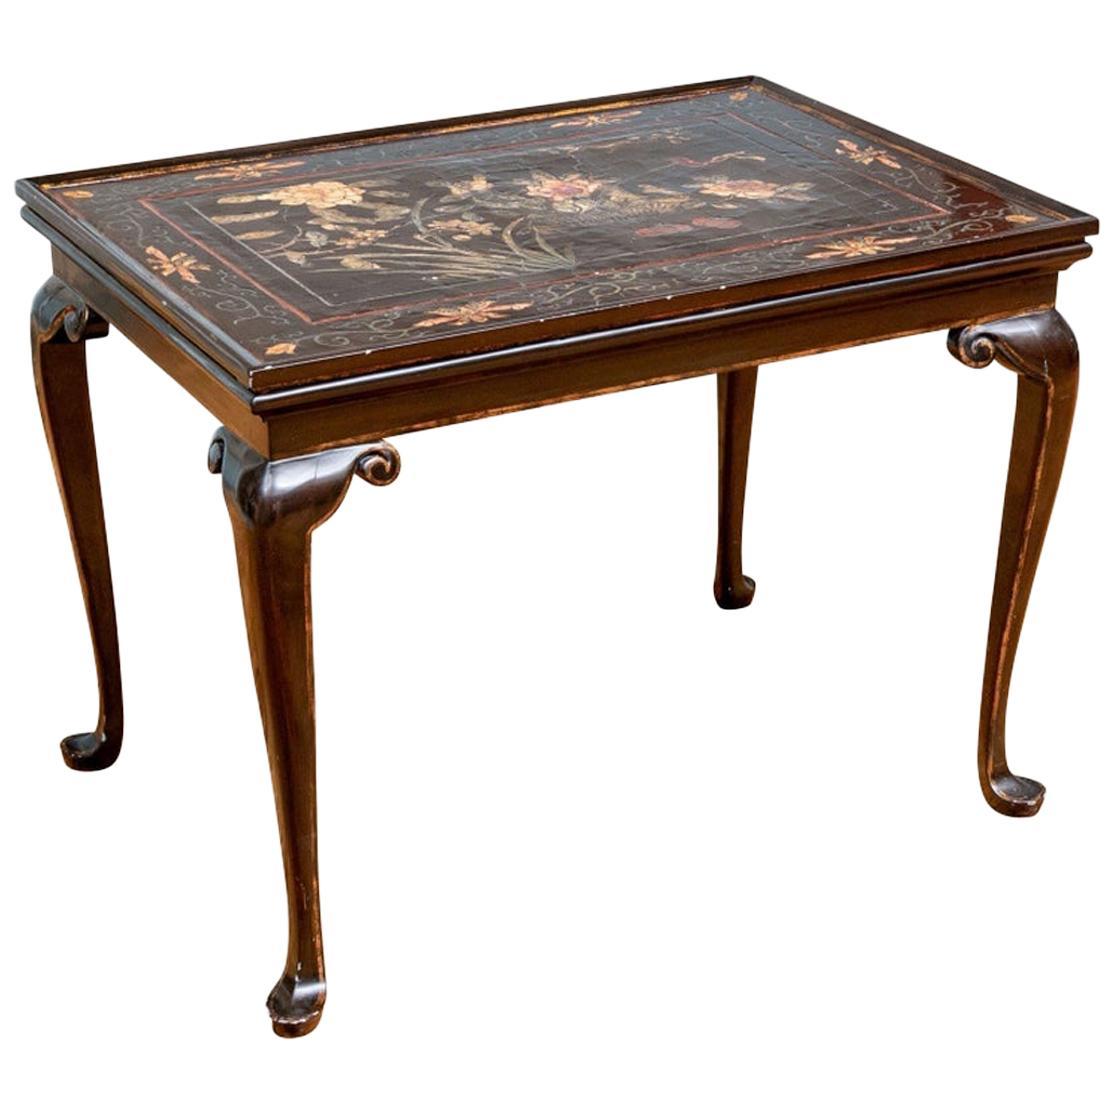 Antique Queen Ann Style Tea Table